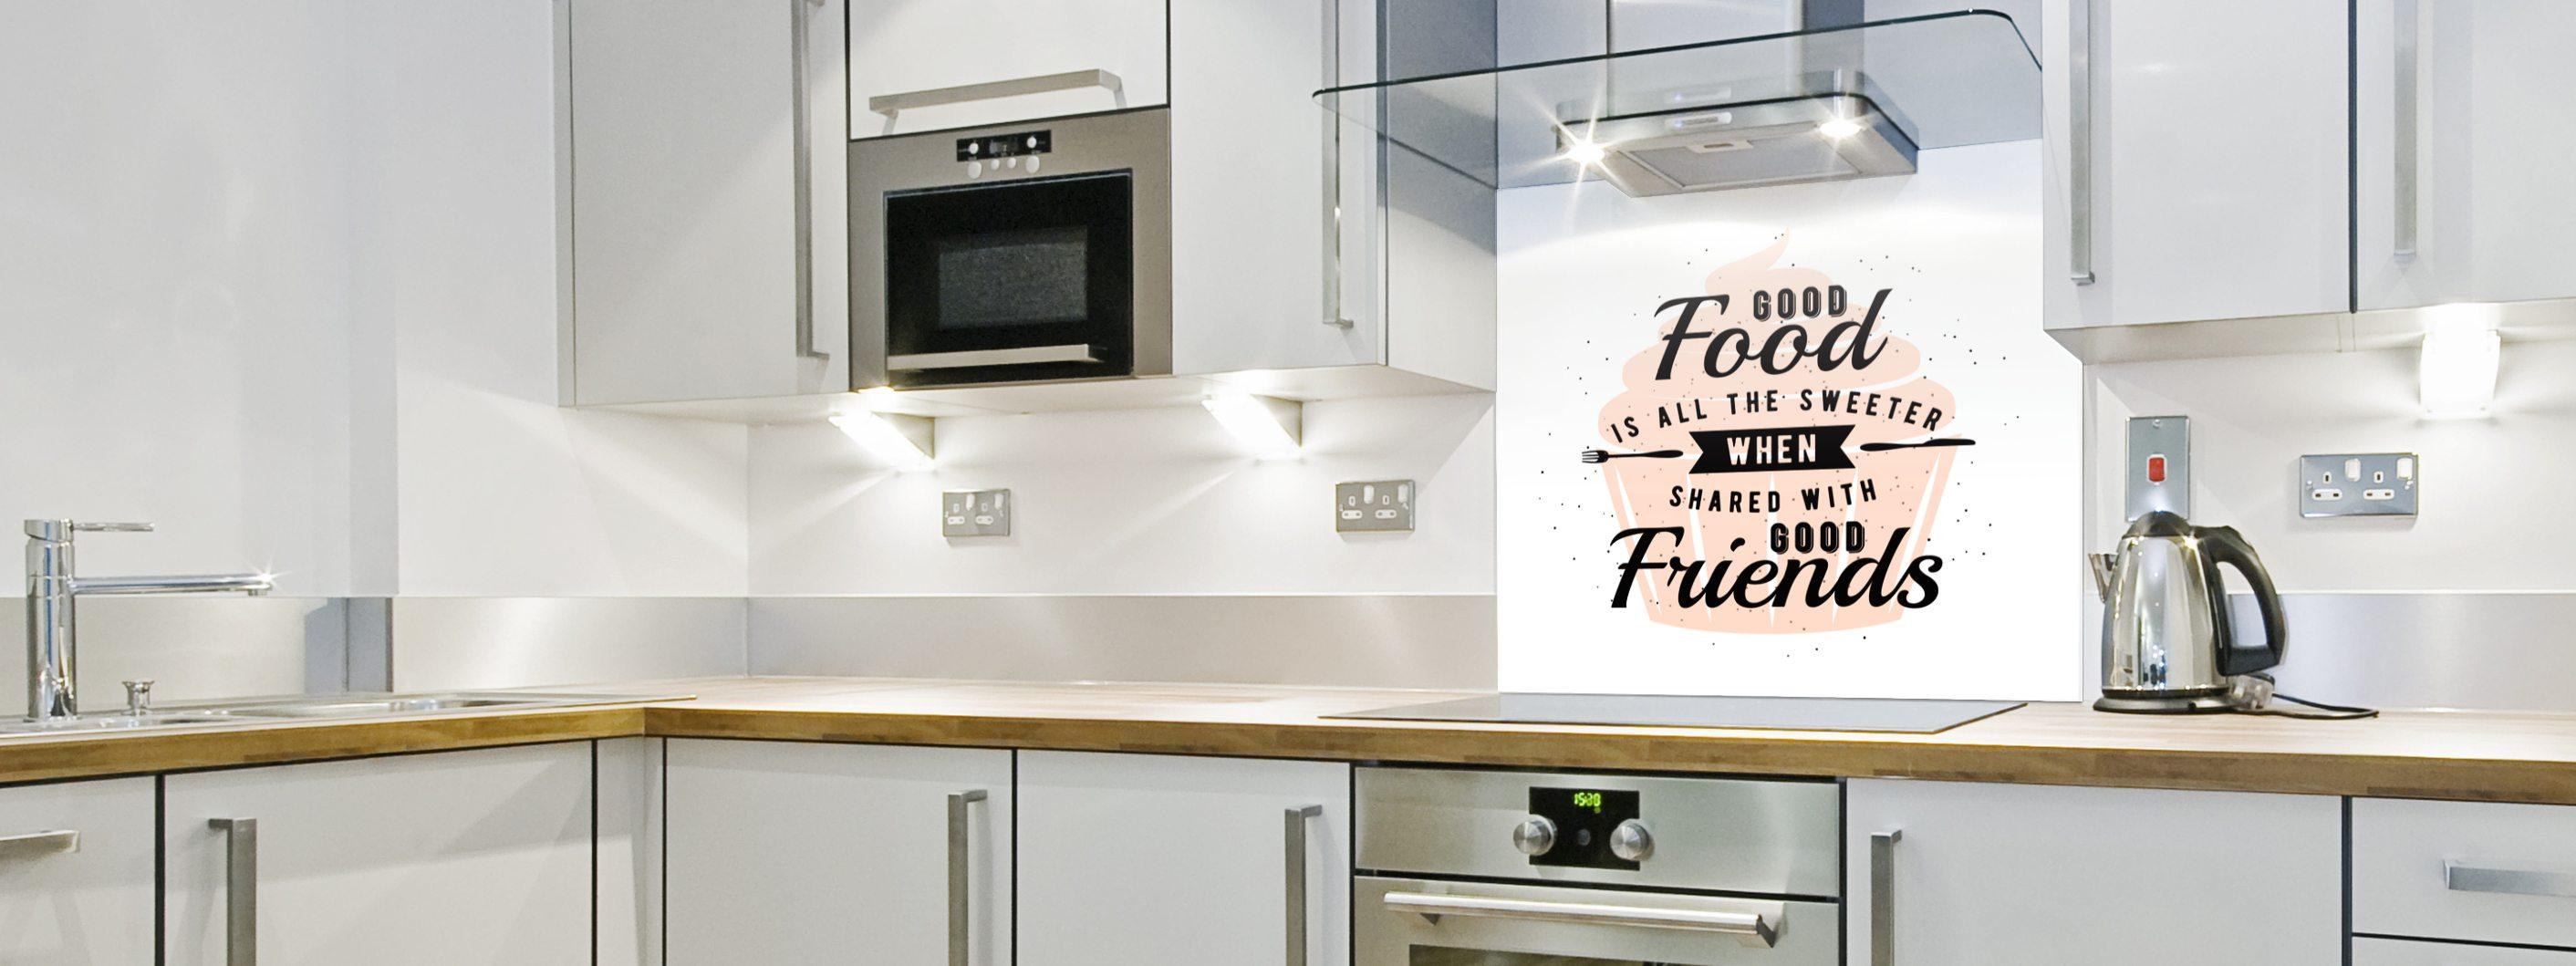 Good Food - Printed Glass Splashbacks